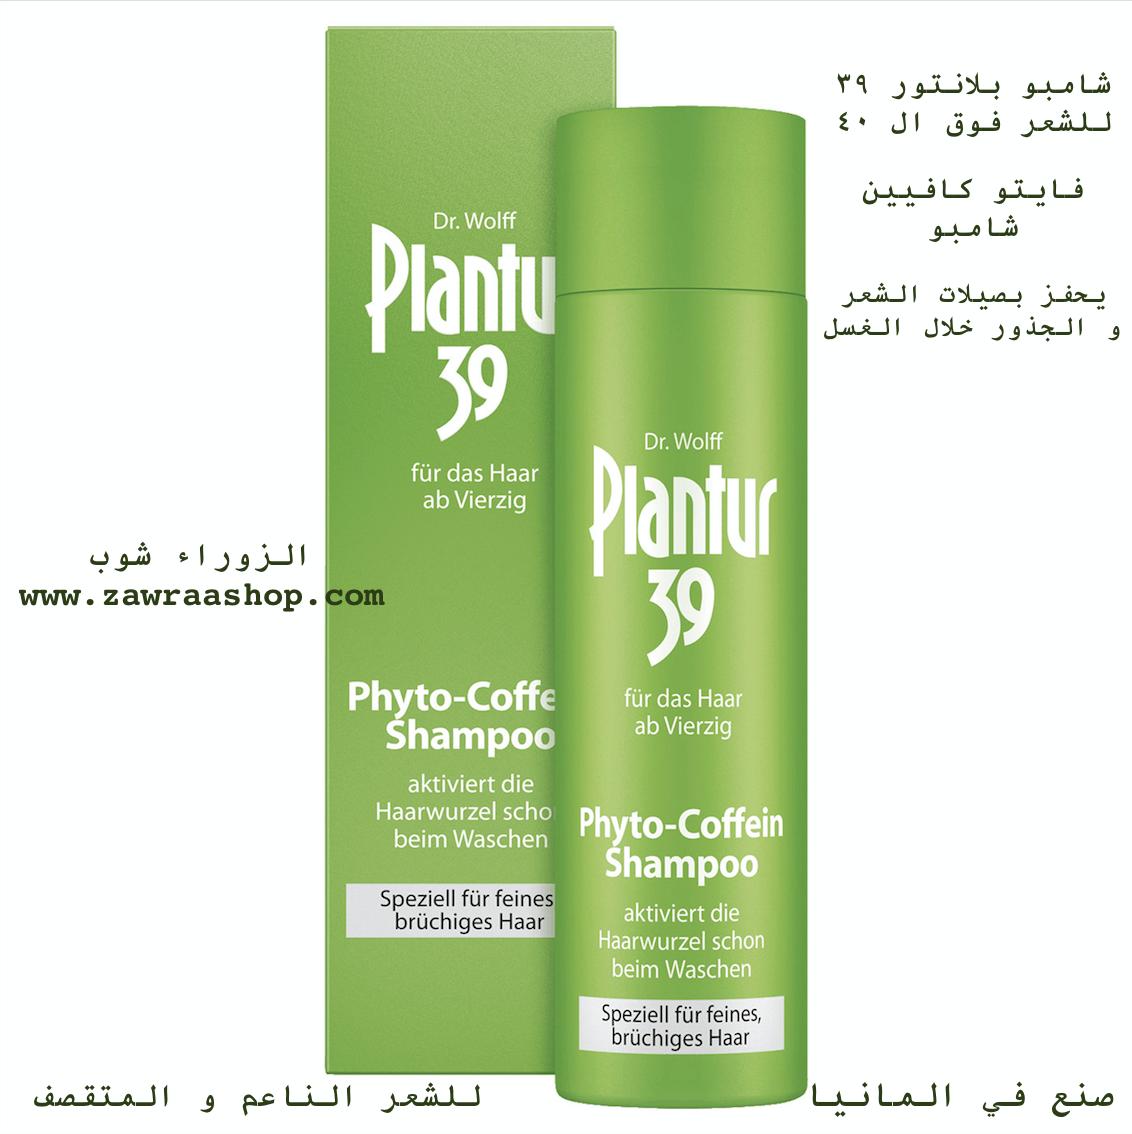 B402 Plantur 39 Phyto-Caffeine shampoo 250ml شامبو بلانتور الالماني 00440